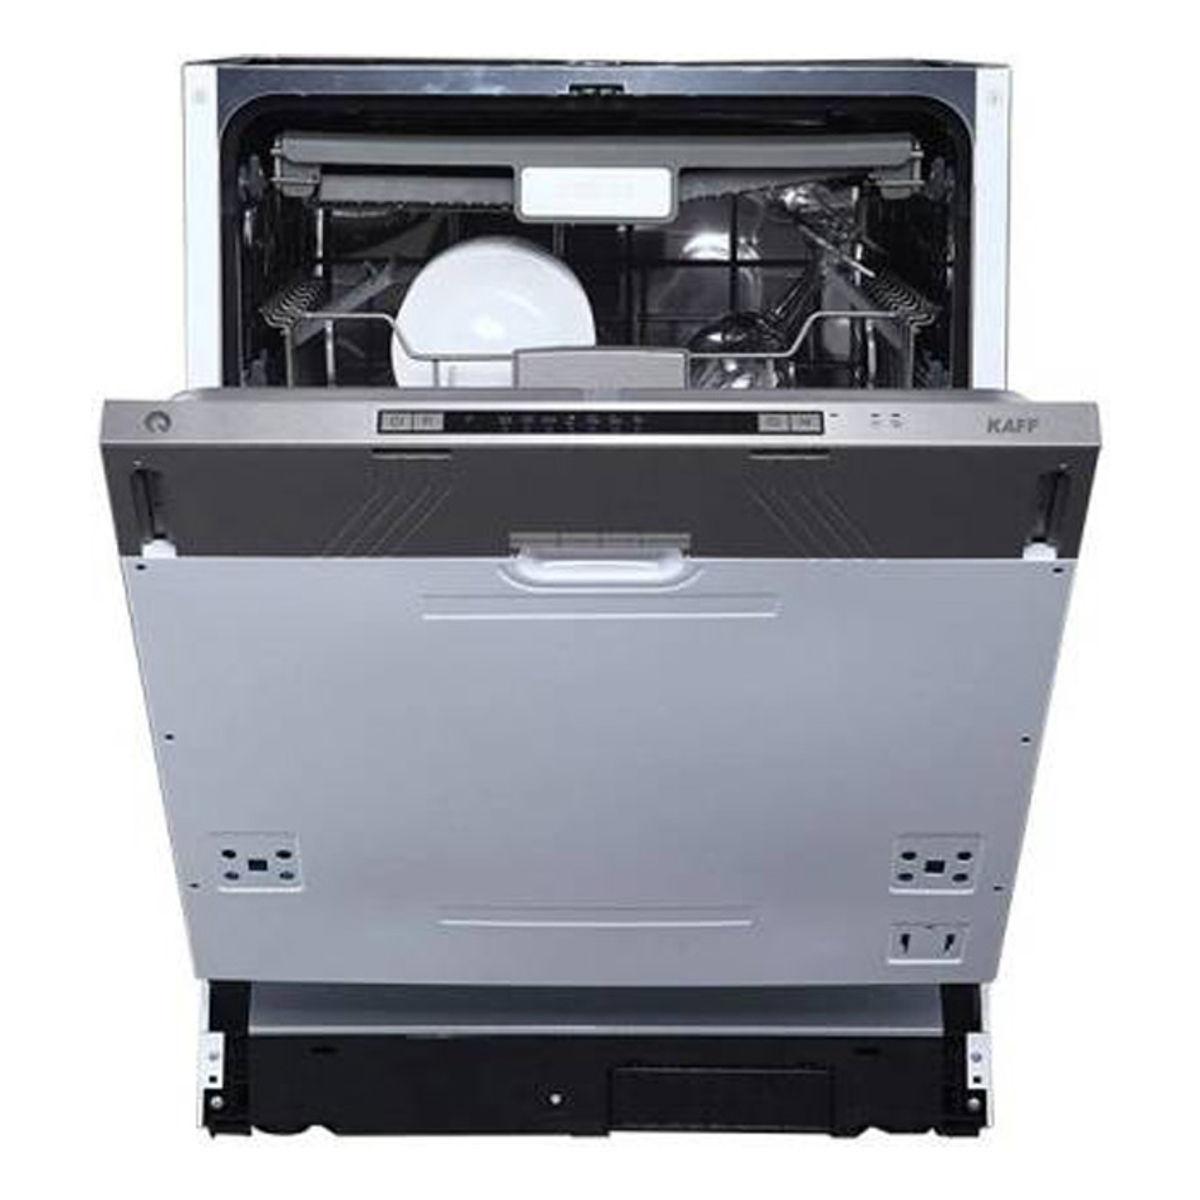 Kaff DW SPECTRA 60 Dishwasher